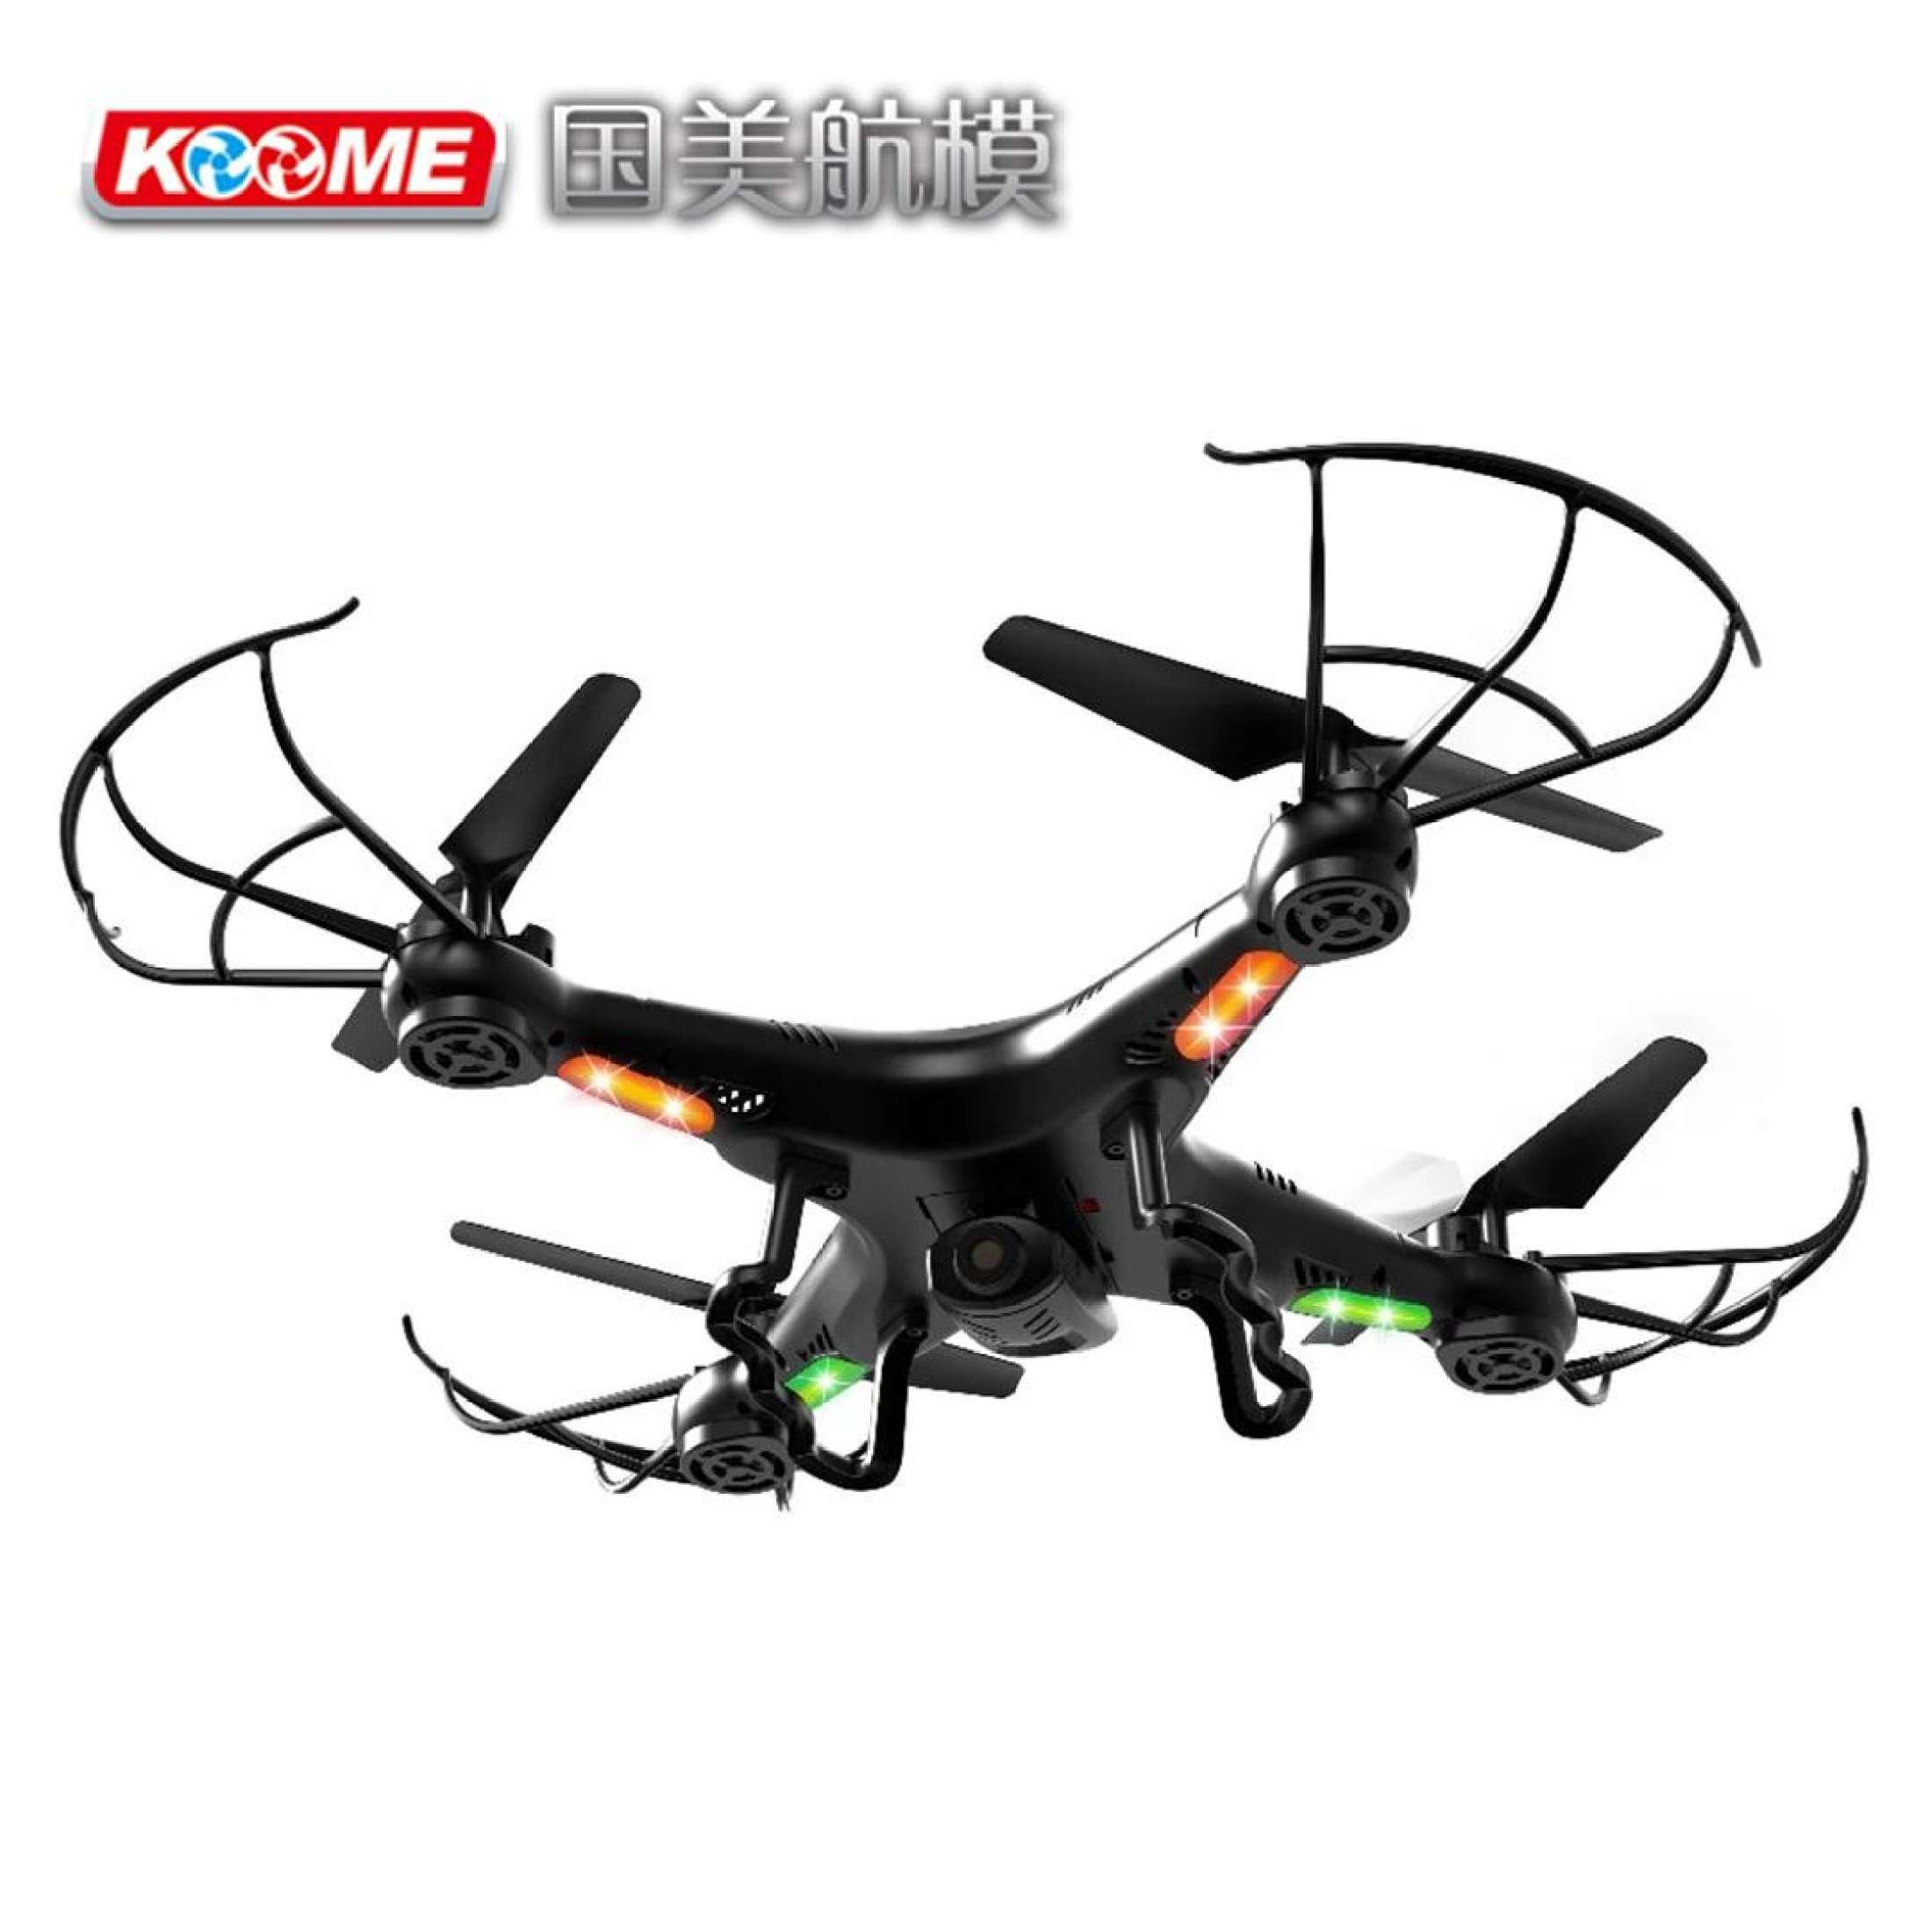 KOOME K300 6-Axis Headless RC Quadcopter Full HD Camera WiFi